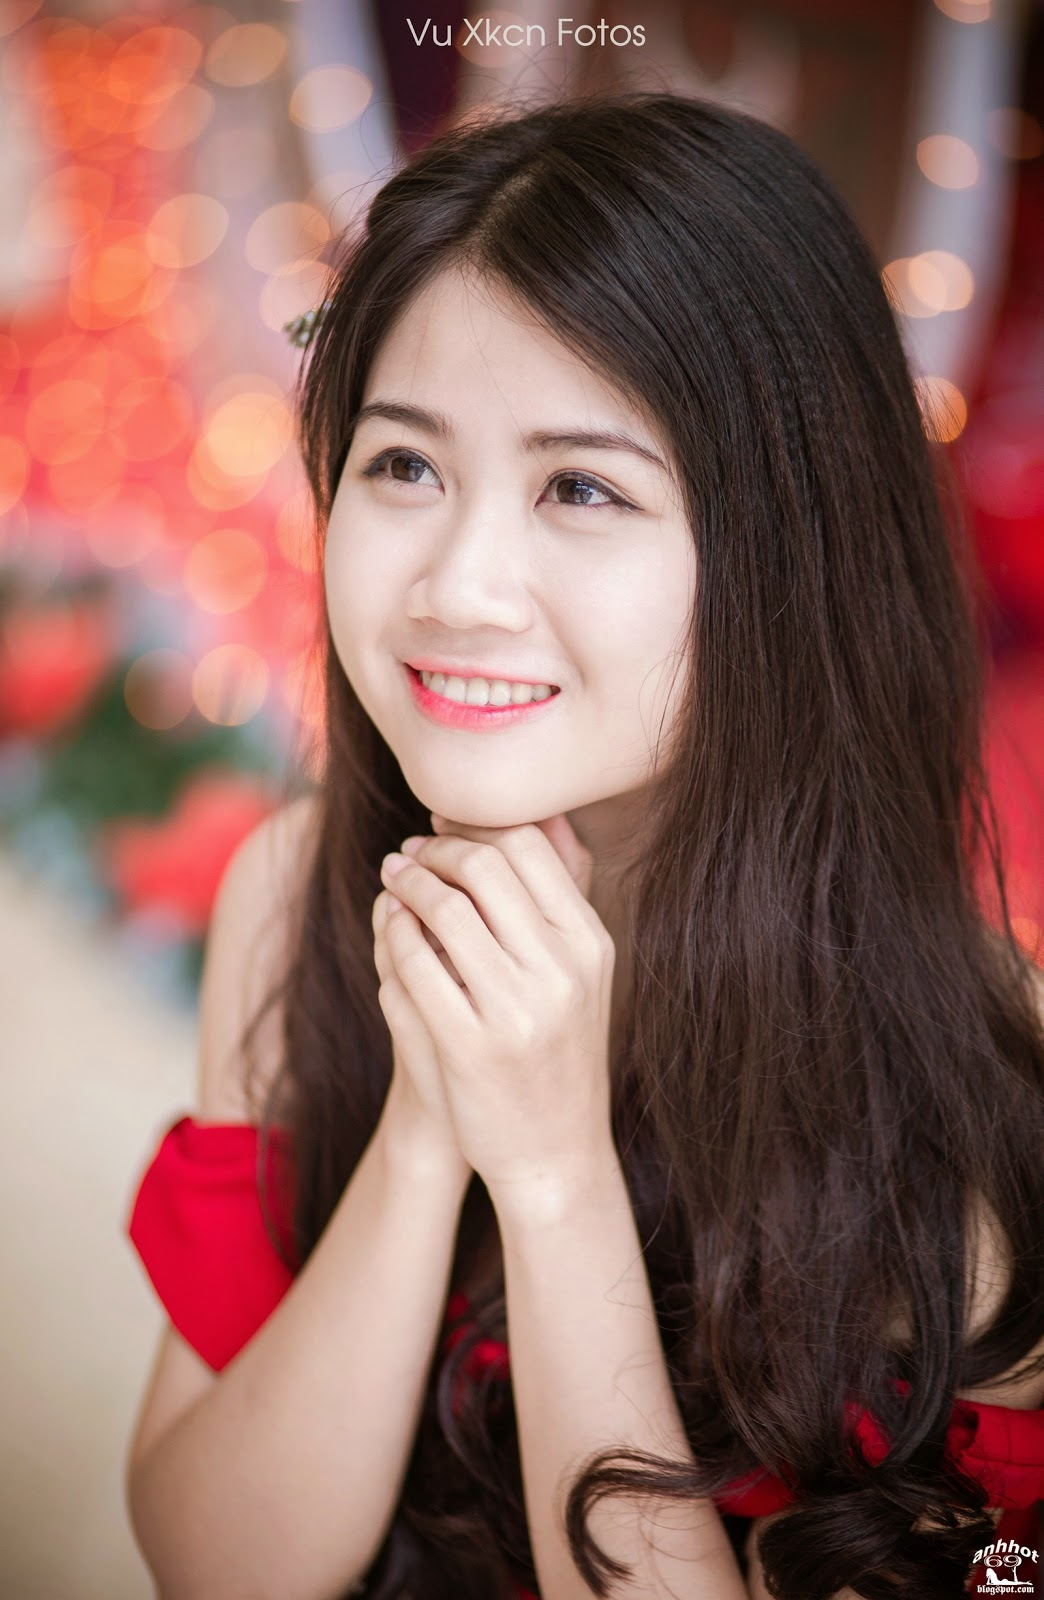 merry-christmas_1412251540_08